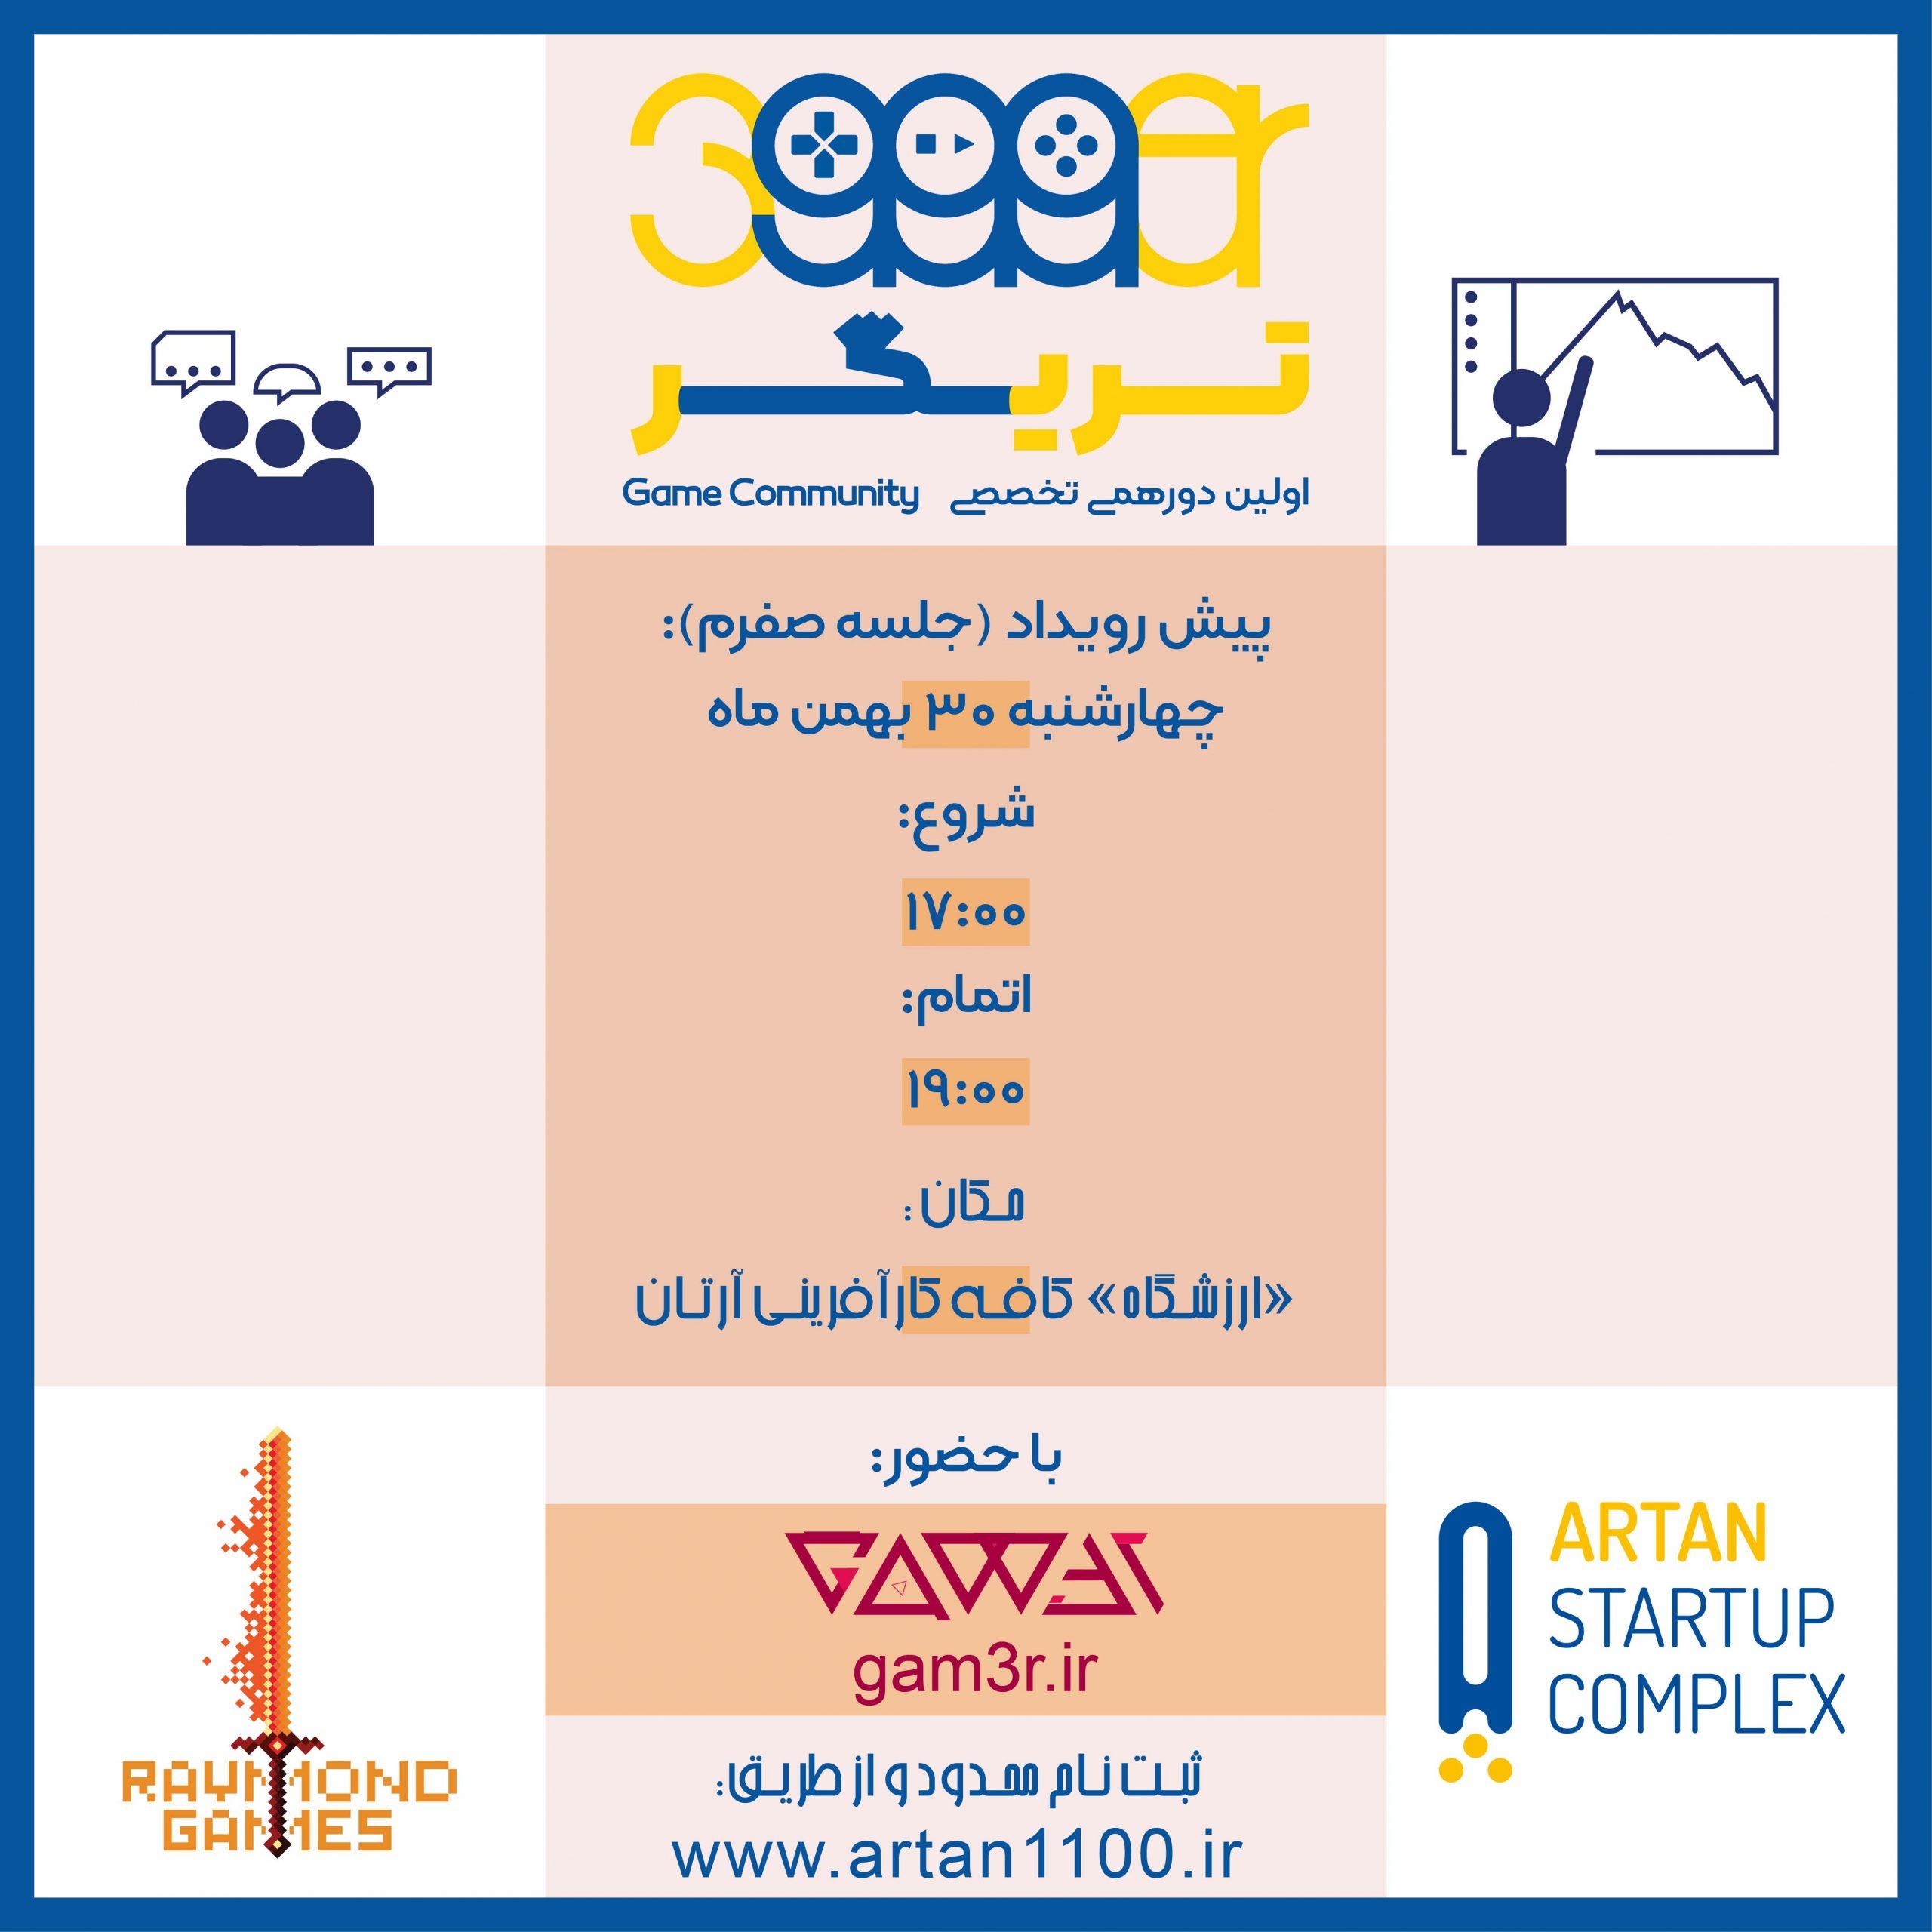 TriGGGer، تریگر، اولین و تنها  دورهمی تخصصی بازیسازی در تبریز